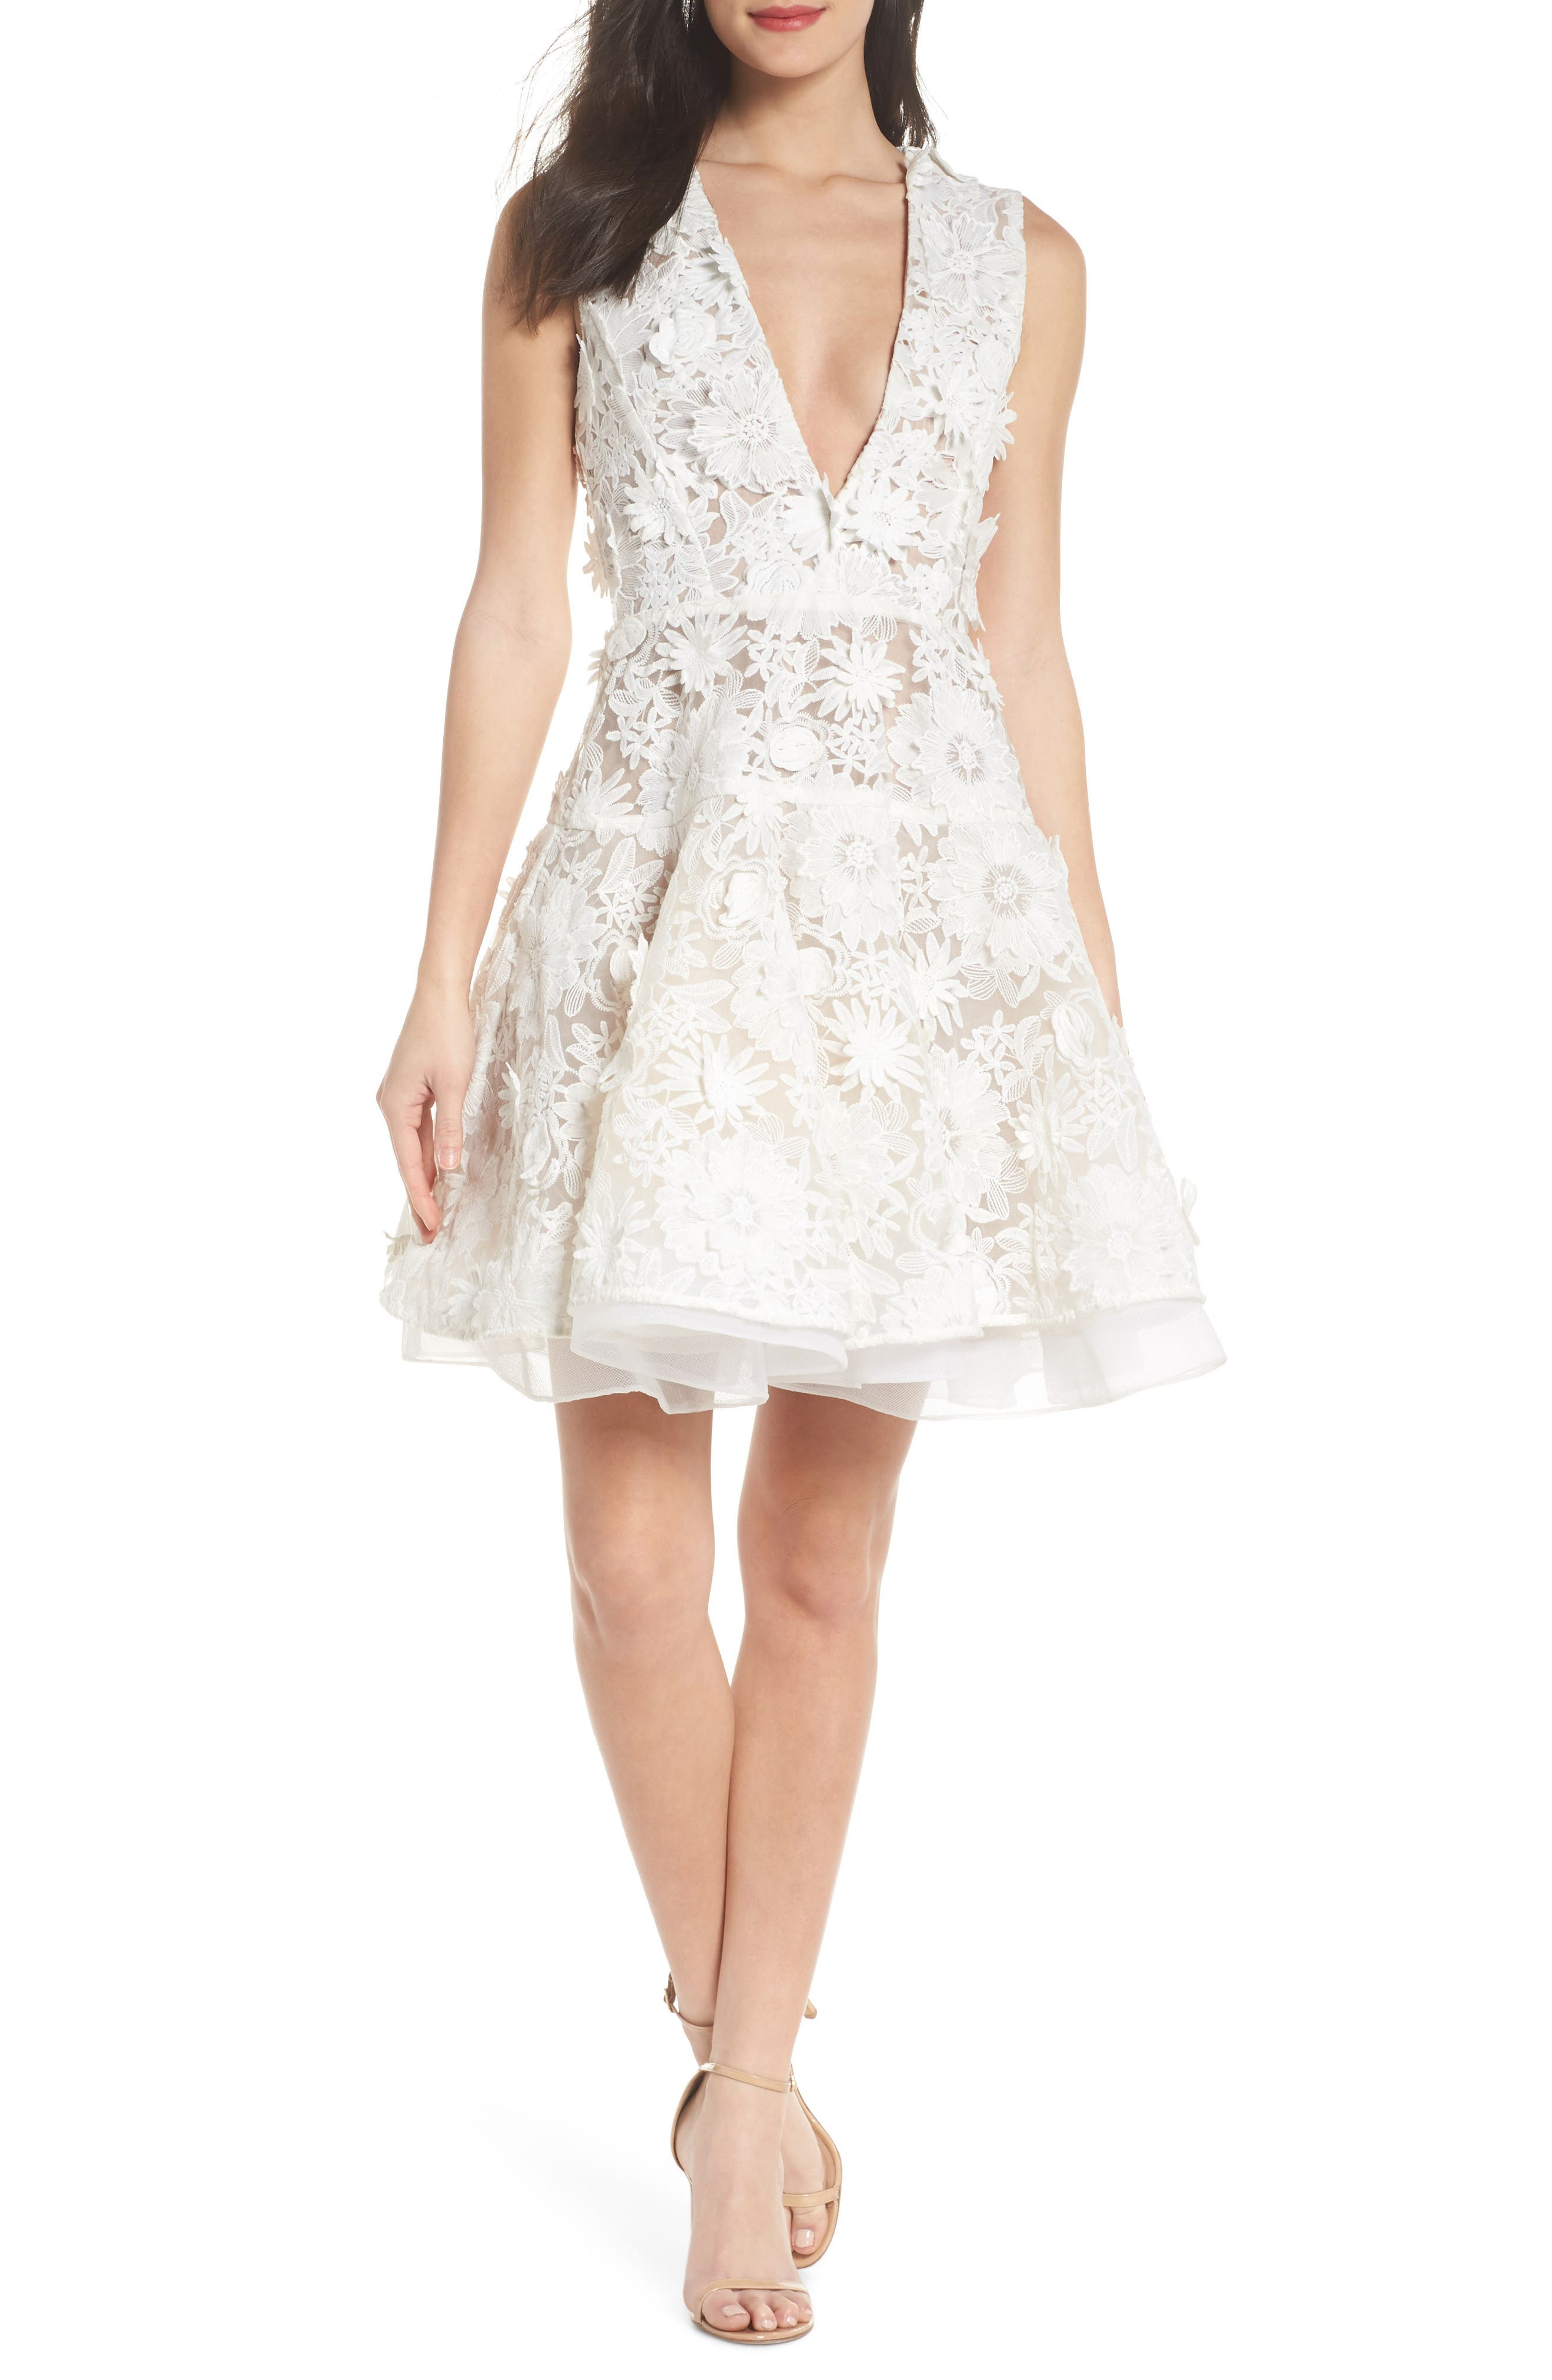 Flowy Short Formal Dresses